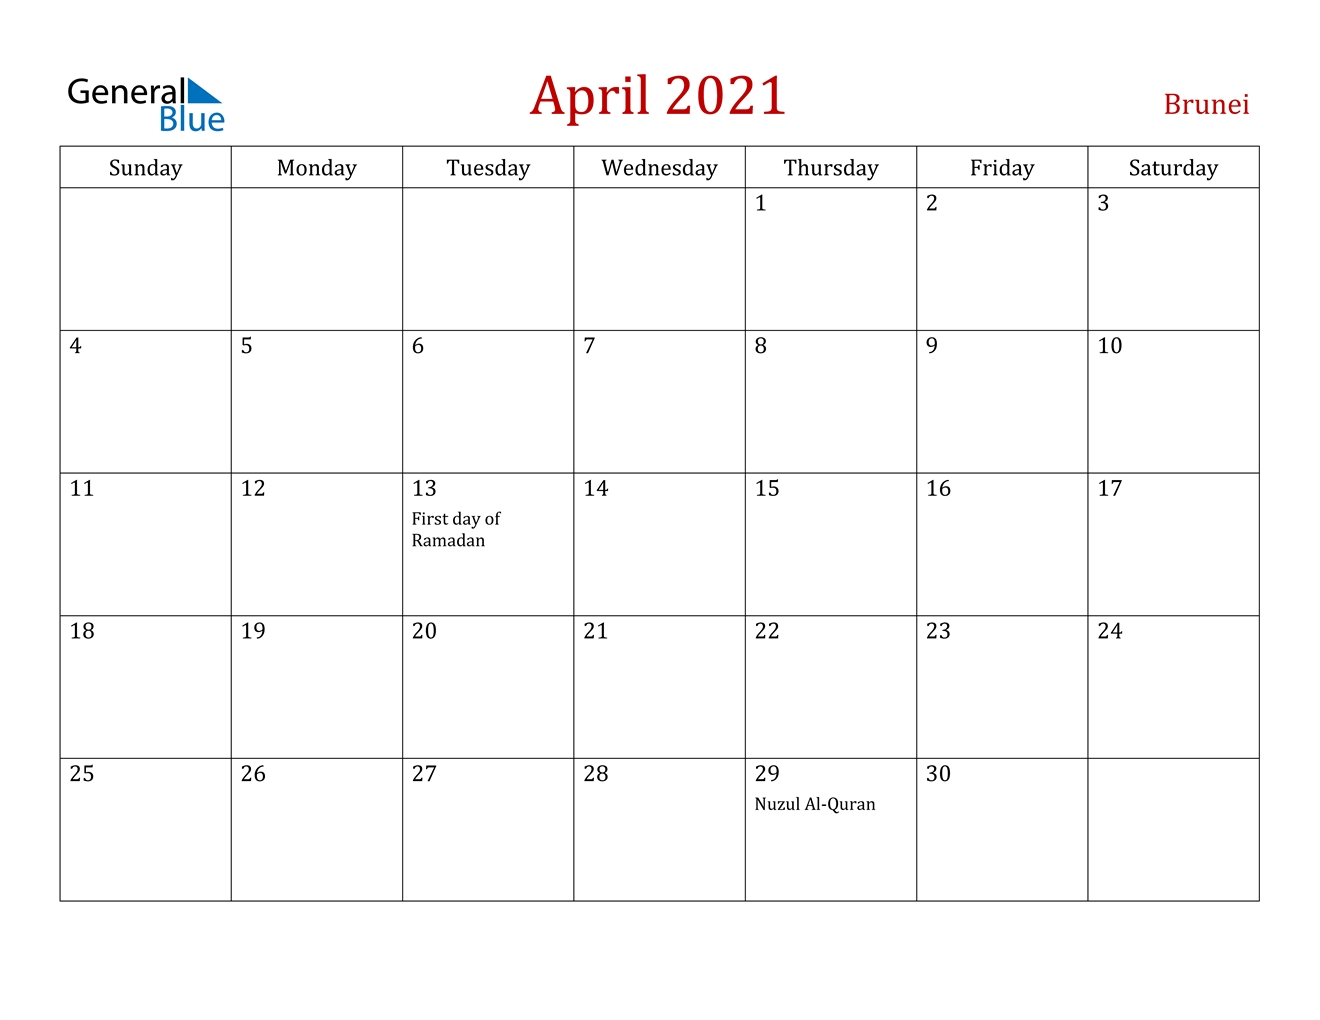 April 2021 Calendar - Brunei in Calendar 2021 Brunei For Print